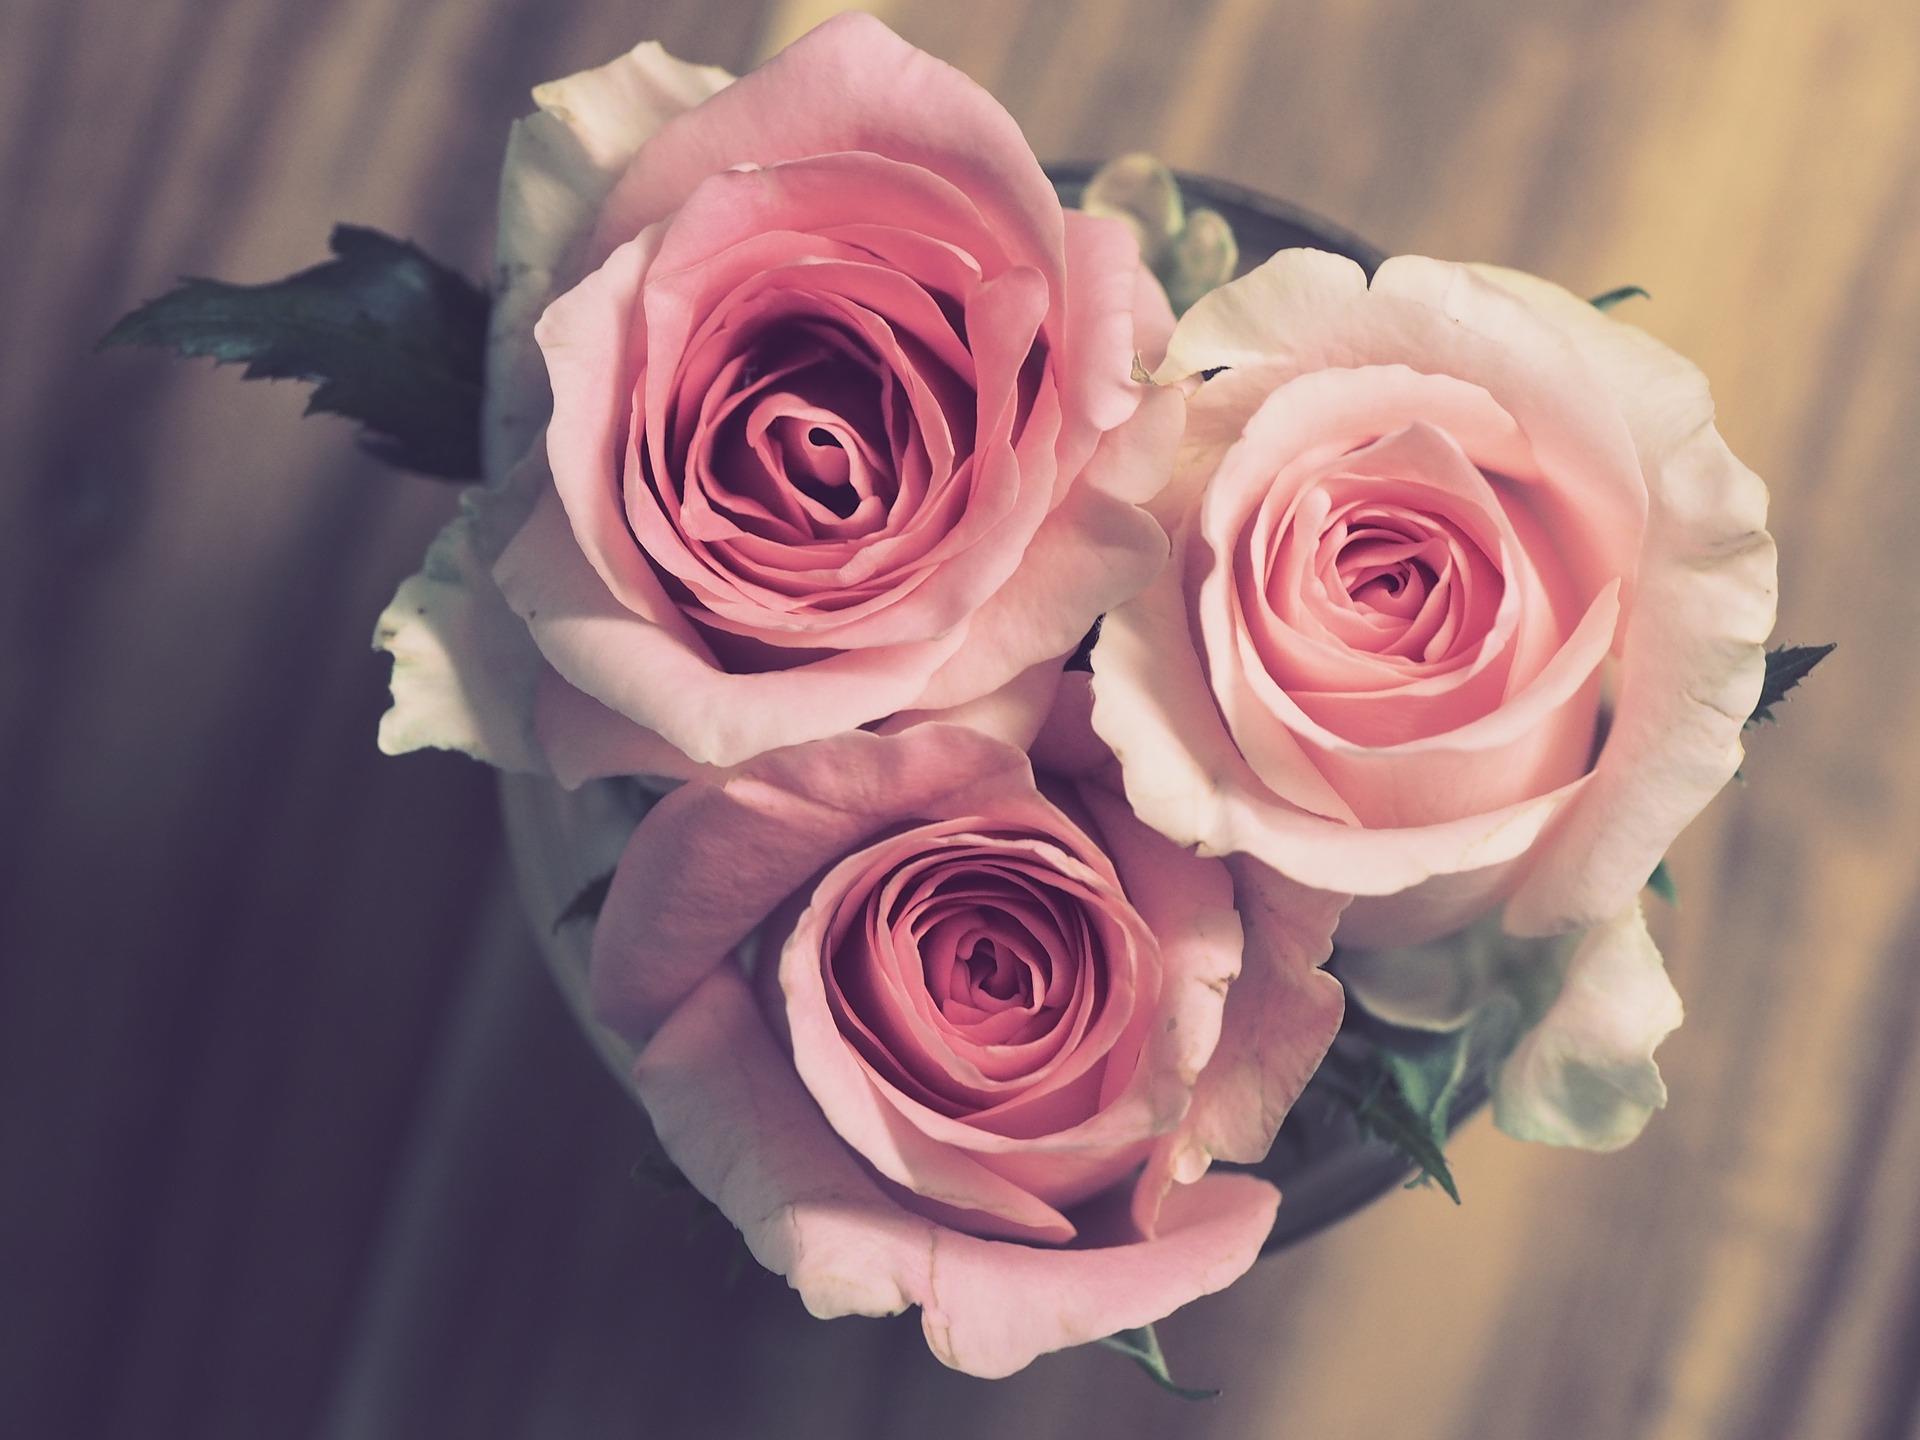 rose-3072698_1920.jpg